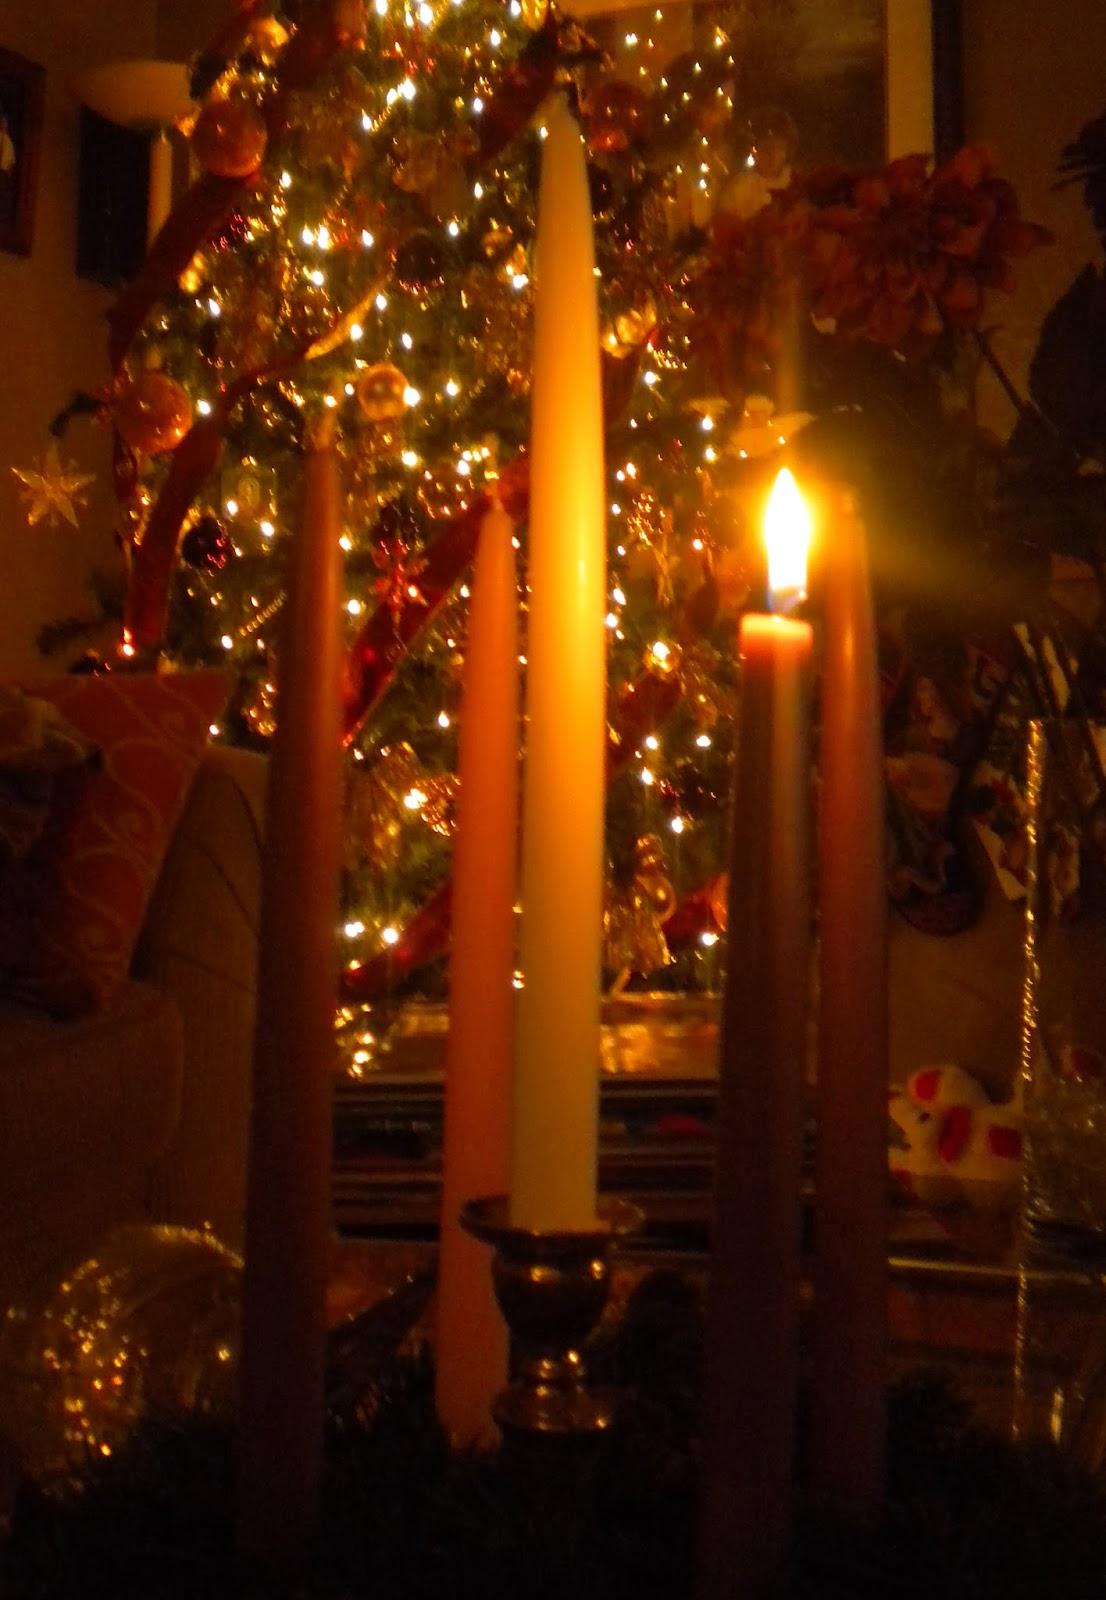 lds seasonal materials first advent hope. Black Bedroom Furniture Sets. Home Design Ideas